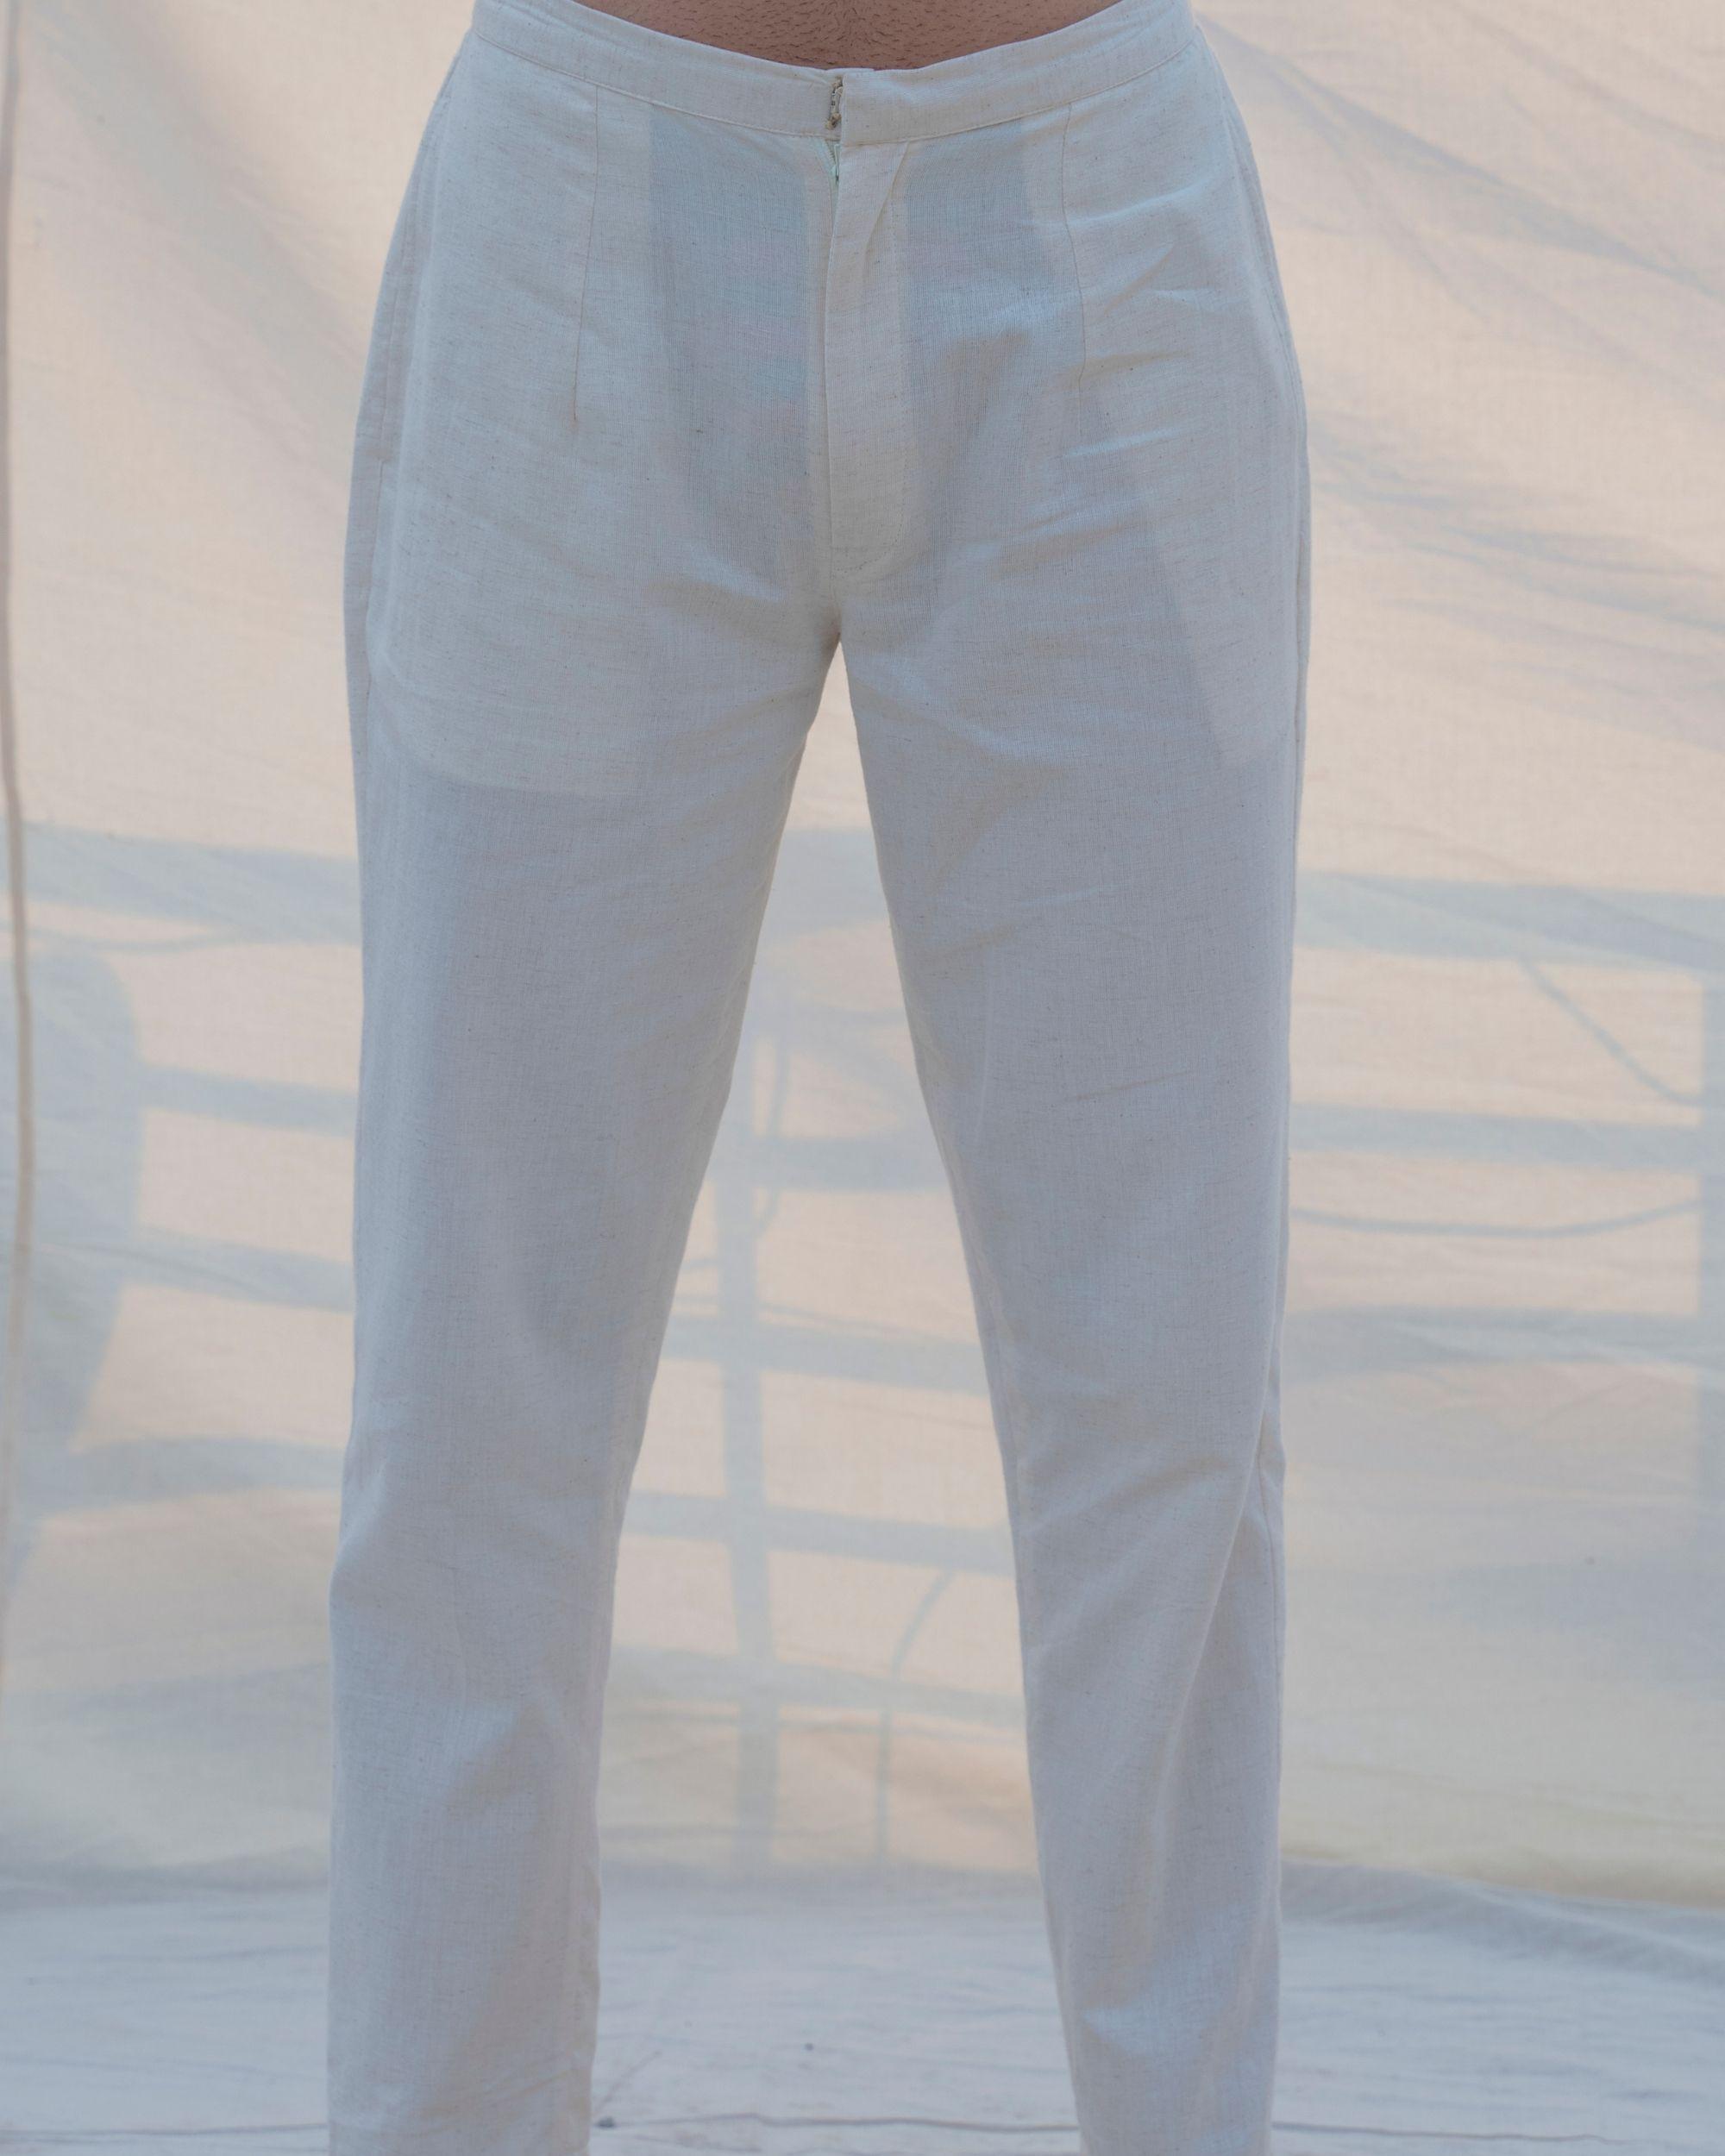 Off white cotton pants